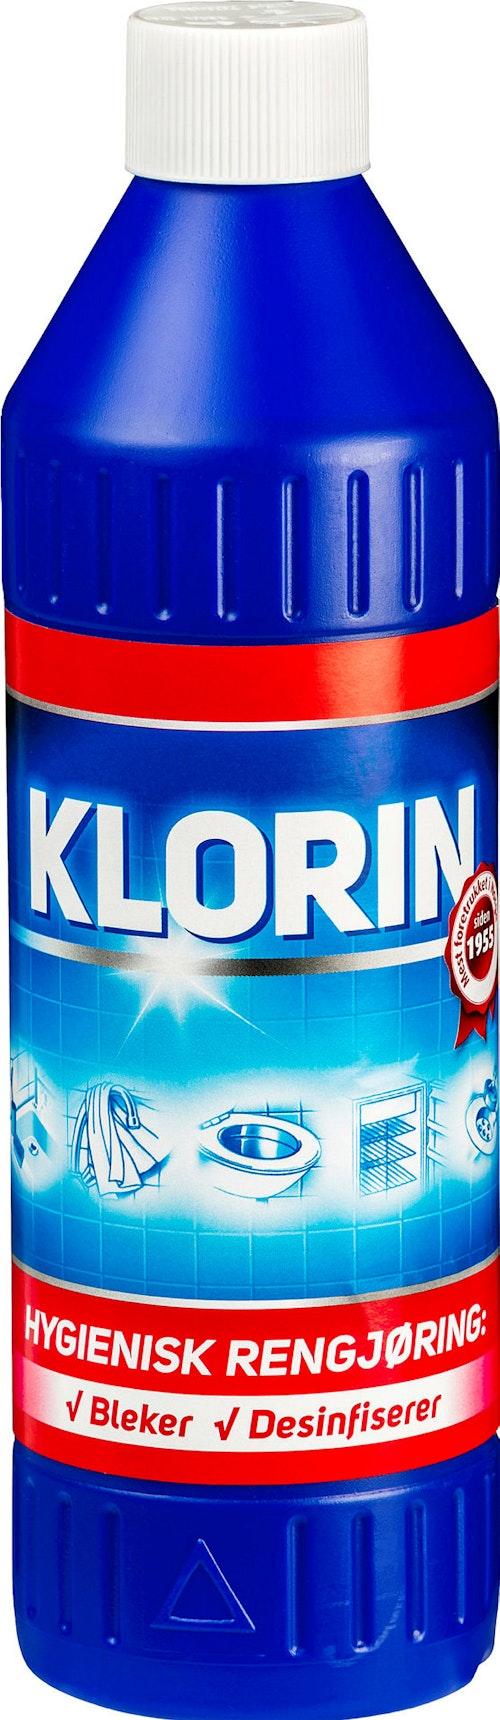 Klorin Klorin 750 ml